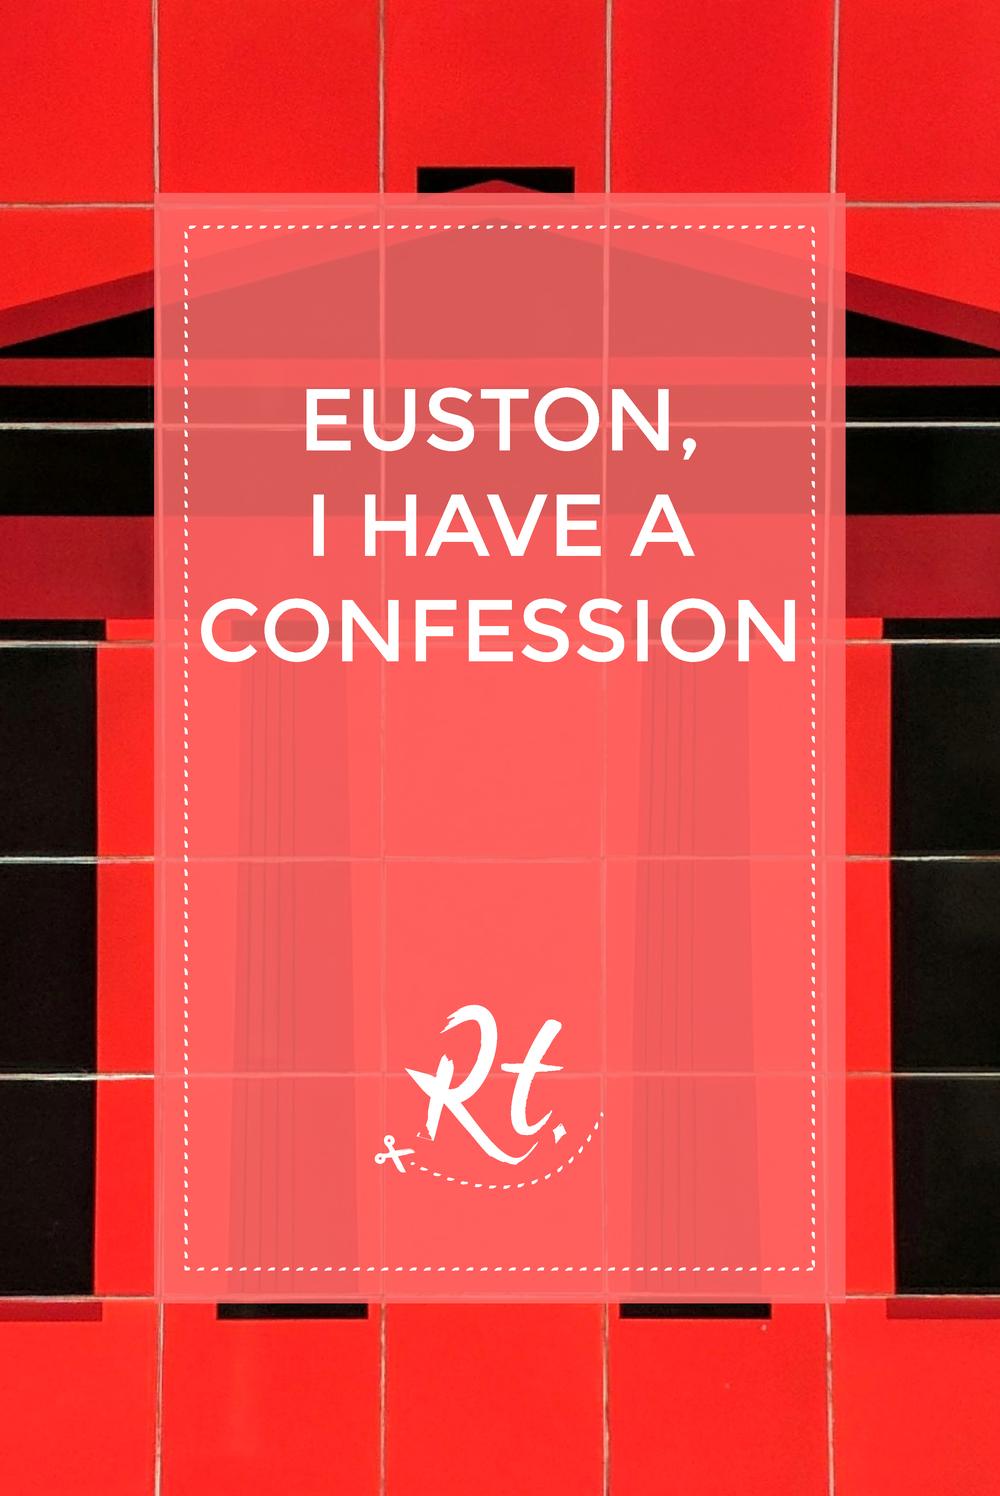 Euston, I Have a Confession by Rosh Thanki, Euston arch tiles